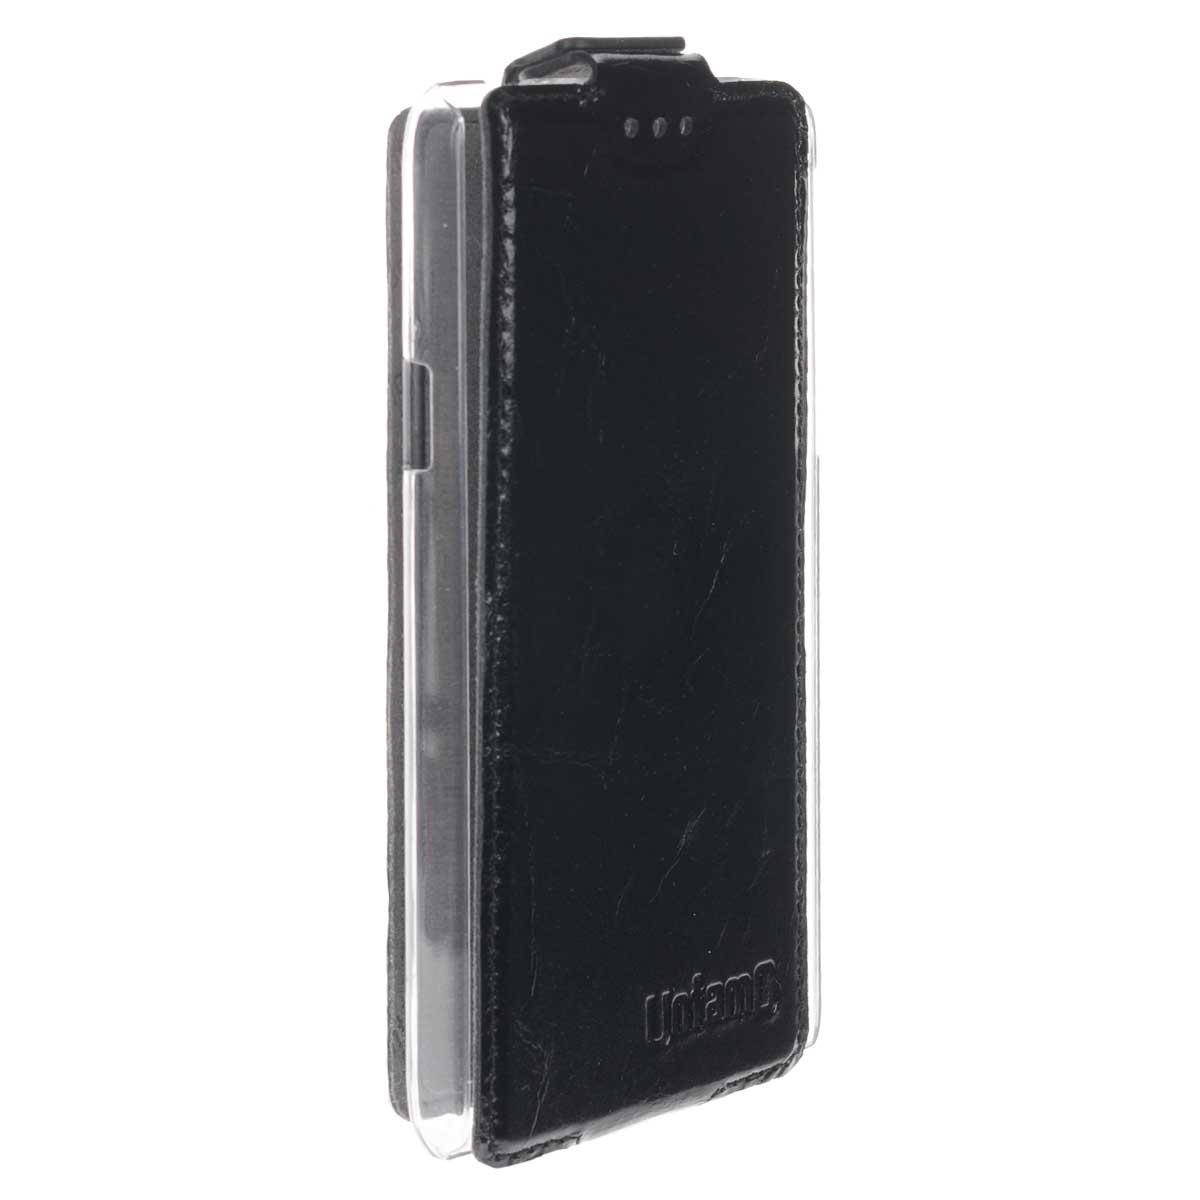 Untamo Timber чехол-флип для Huawei Honor II, Black (UTIMFHH2B)